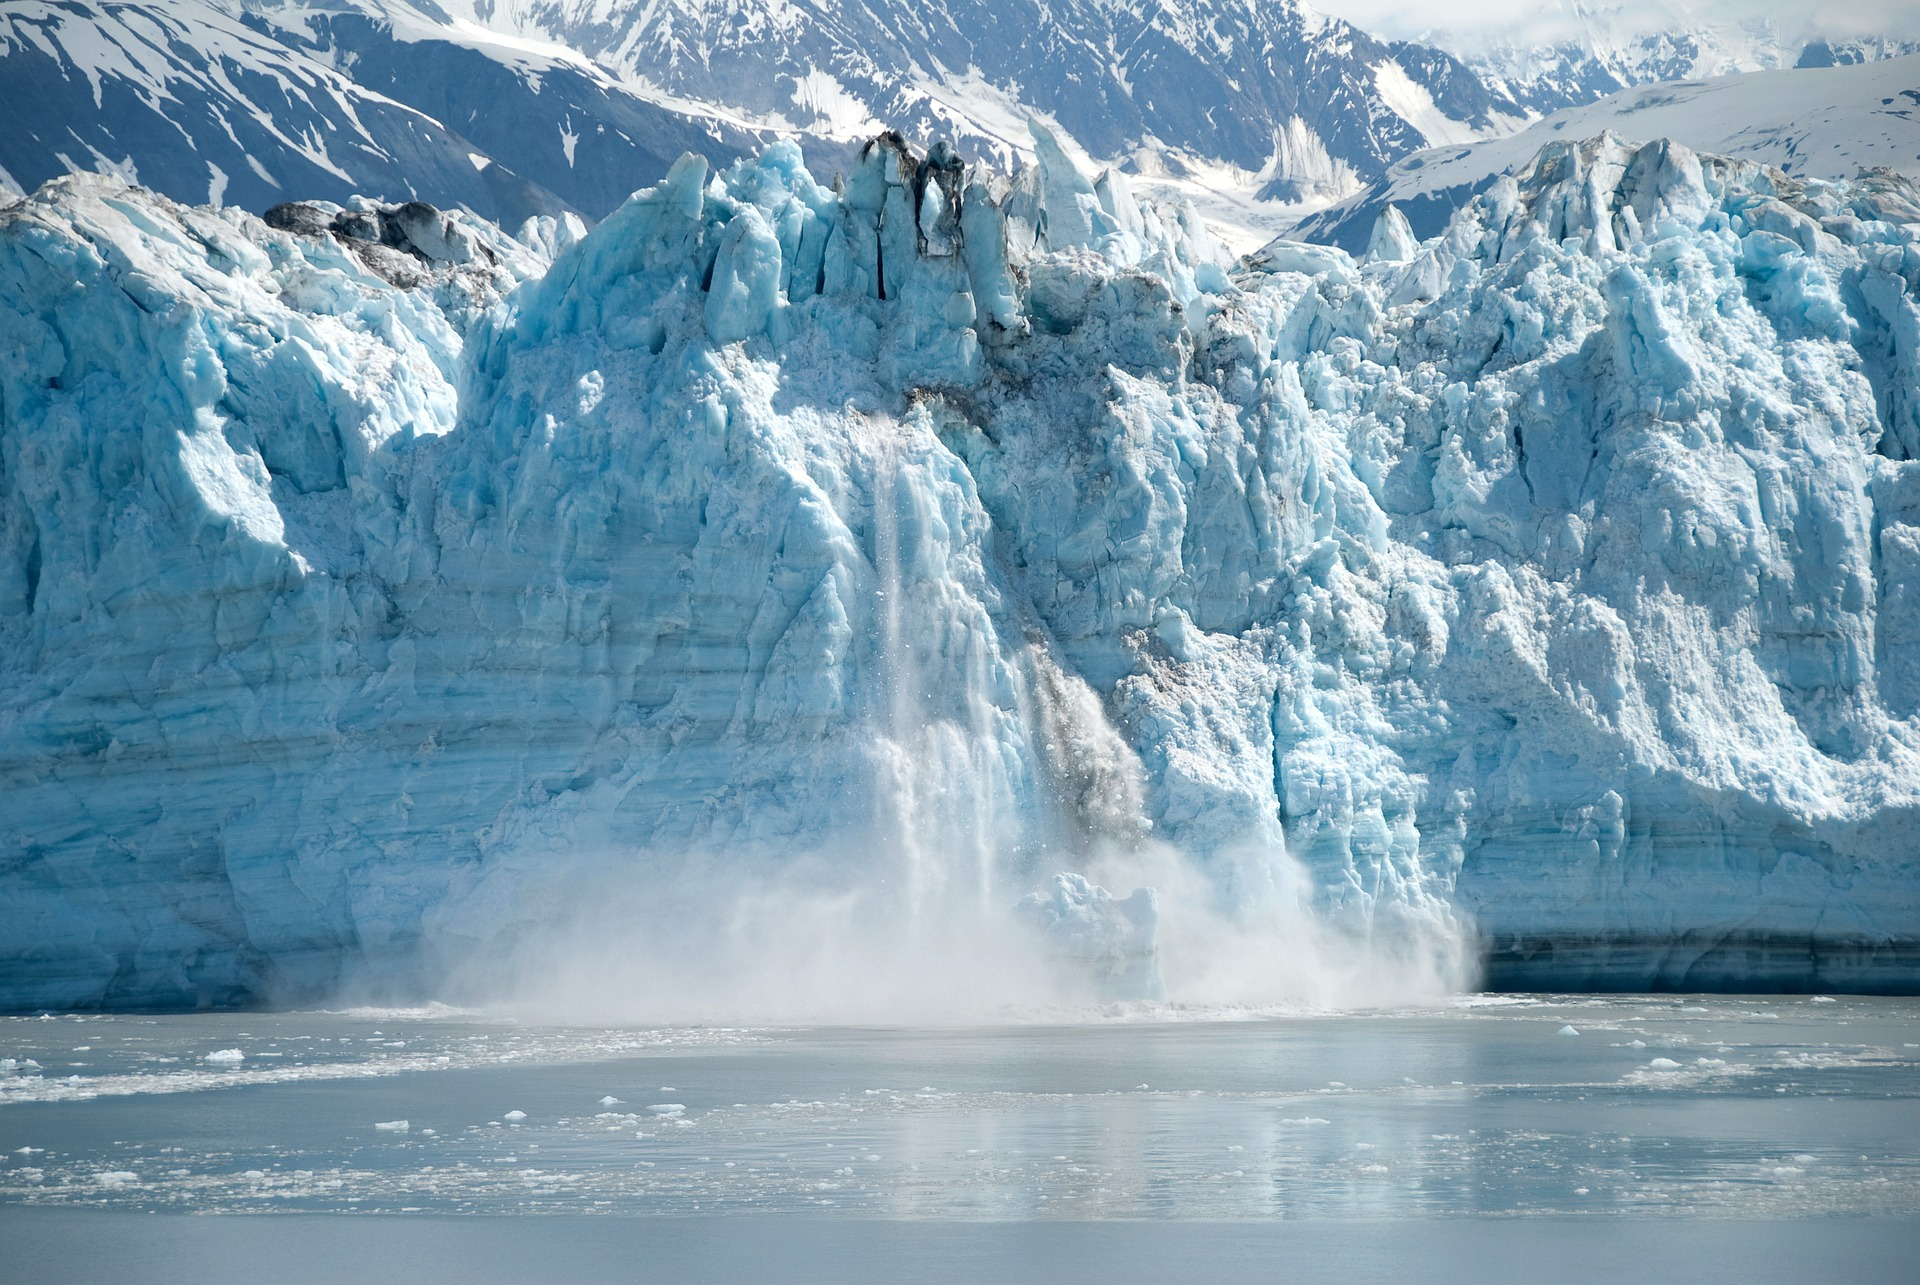 Traveling to Alaska glacier calving